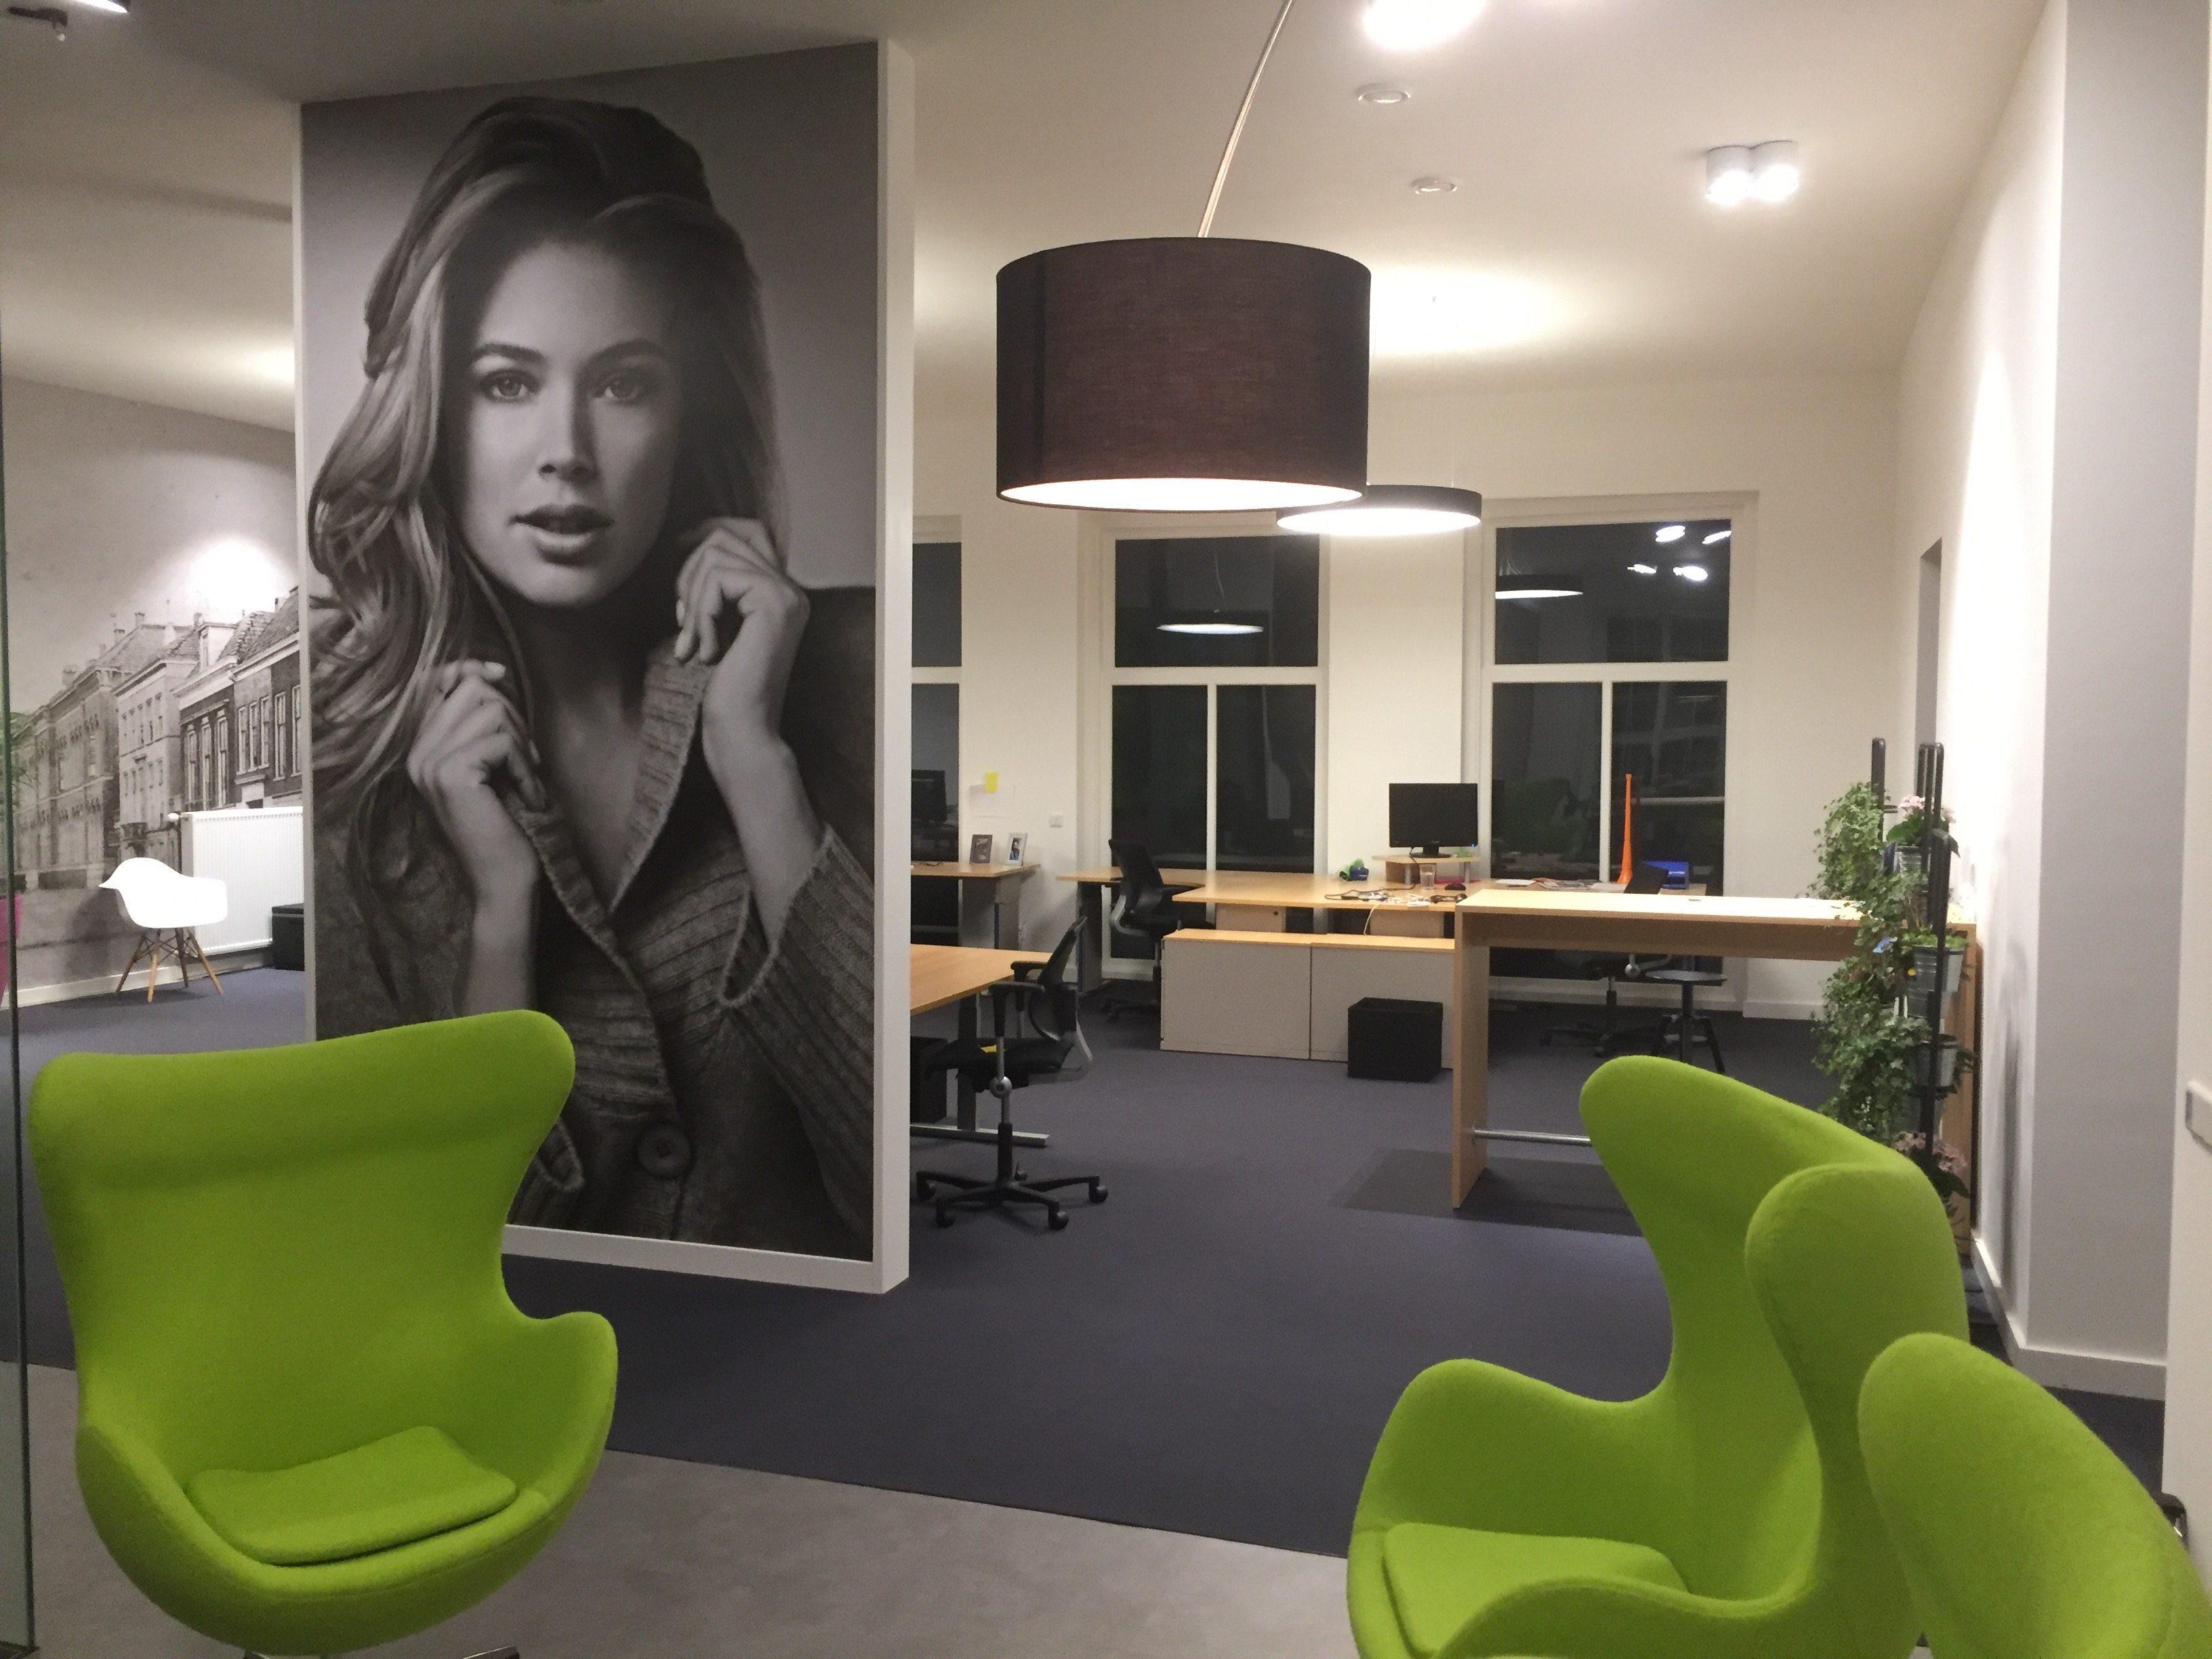 Interieuwontwerp kantoorpand Leeuwarden